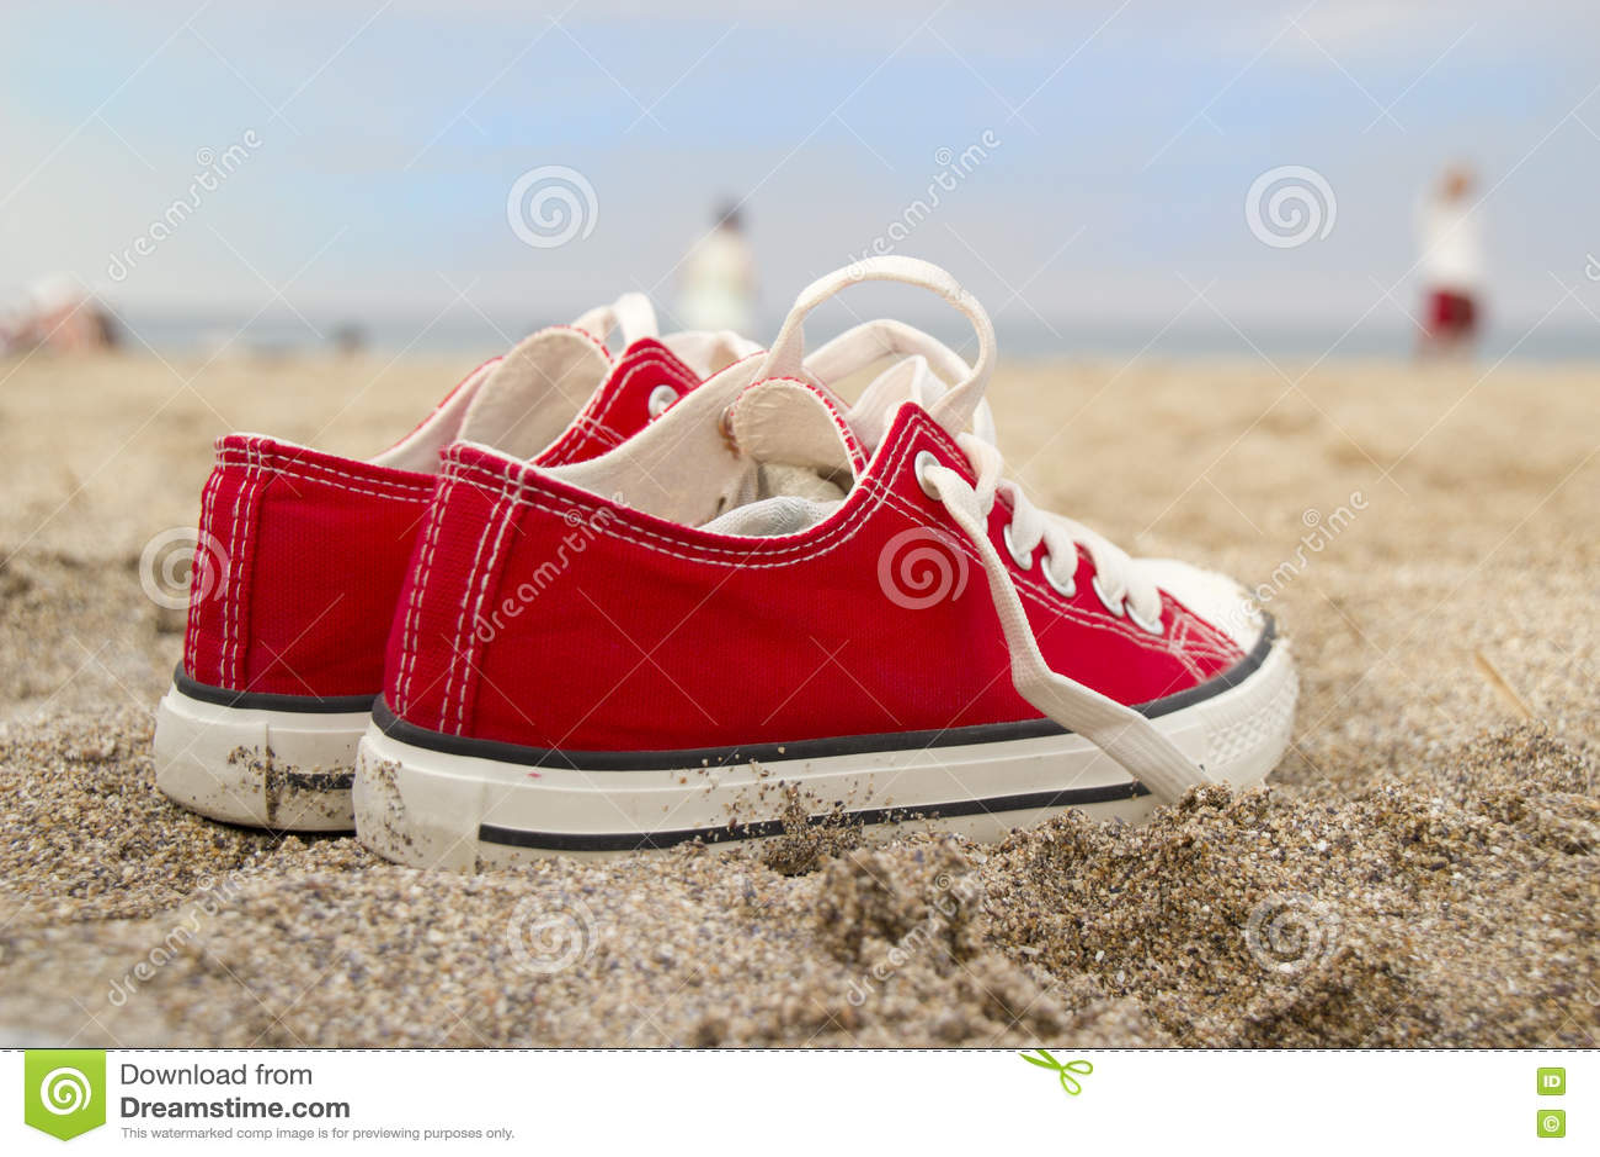 Rote Turnschuhe auf sandigem Strand